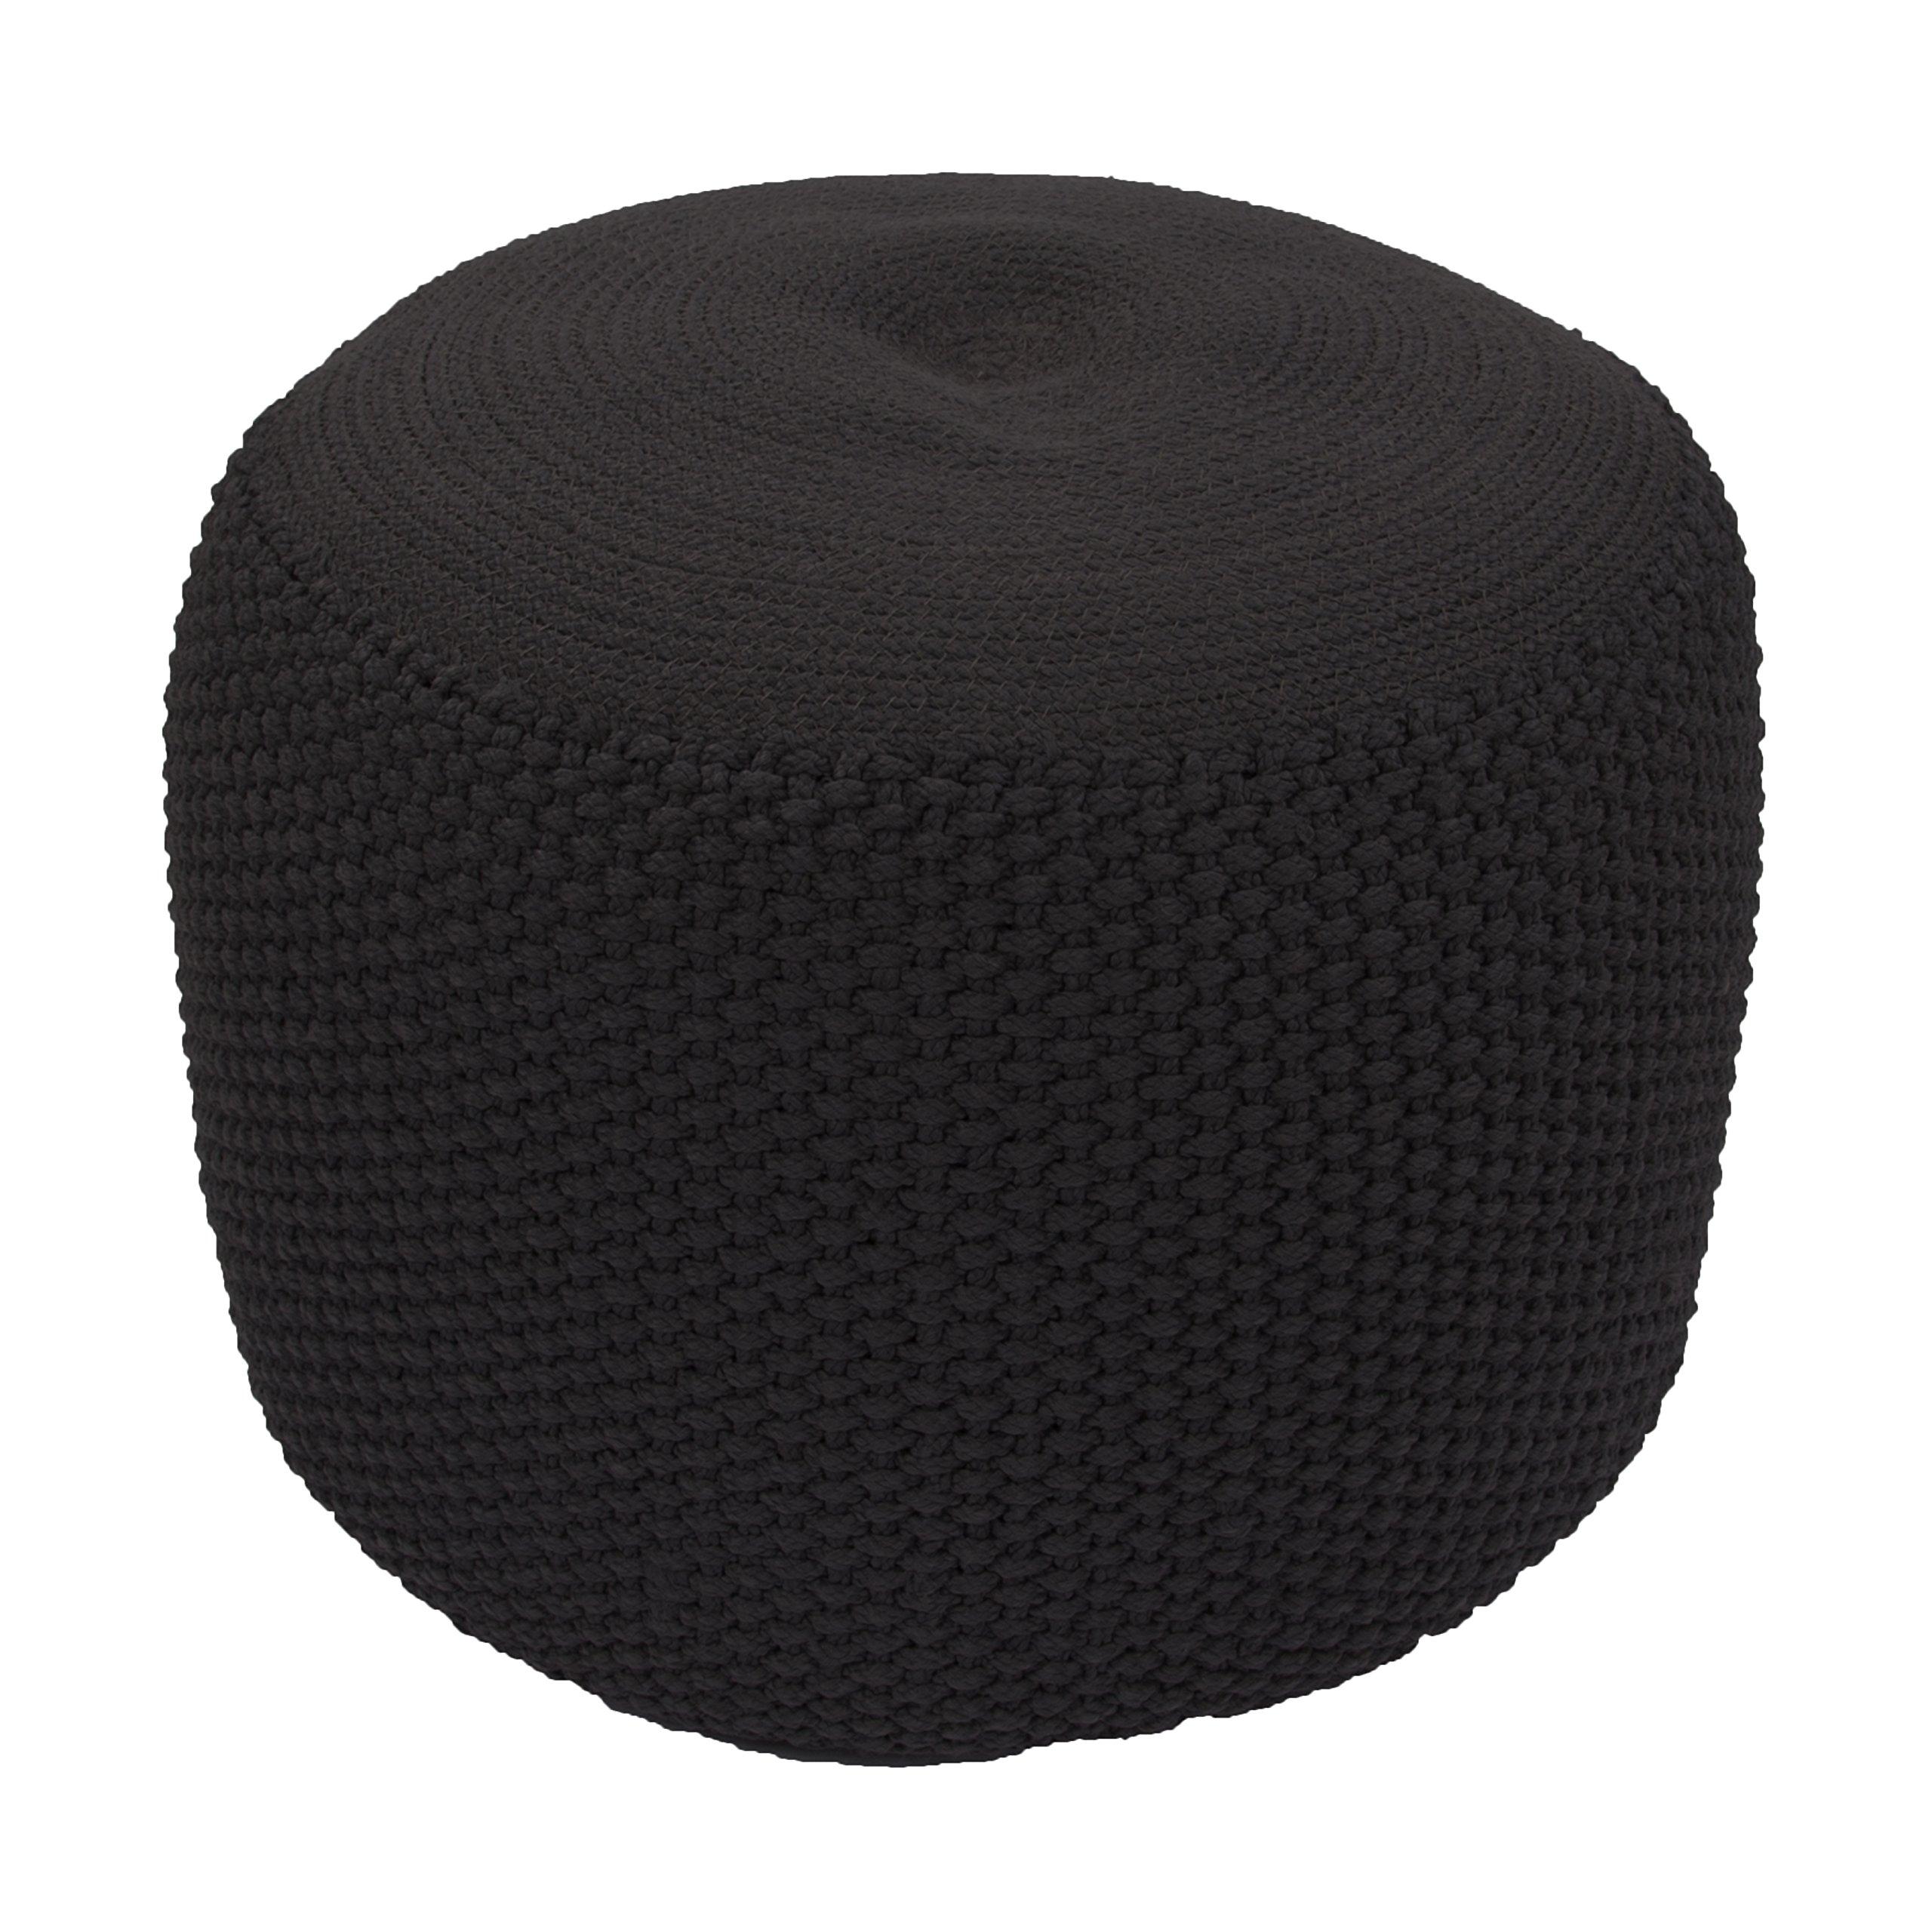 Jaipur Solid Pattern Black Polypropylene Pouf, 20-Inch x 20-Inch x 14-Inch, Jet Rustic